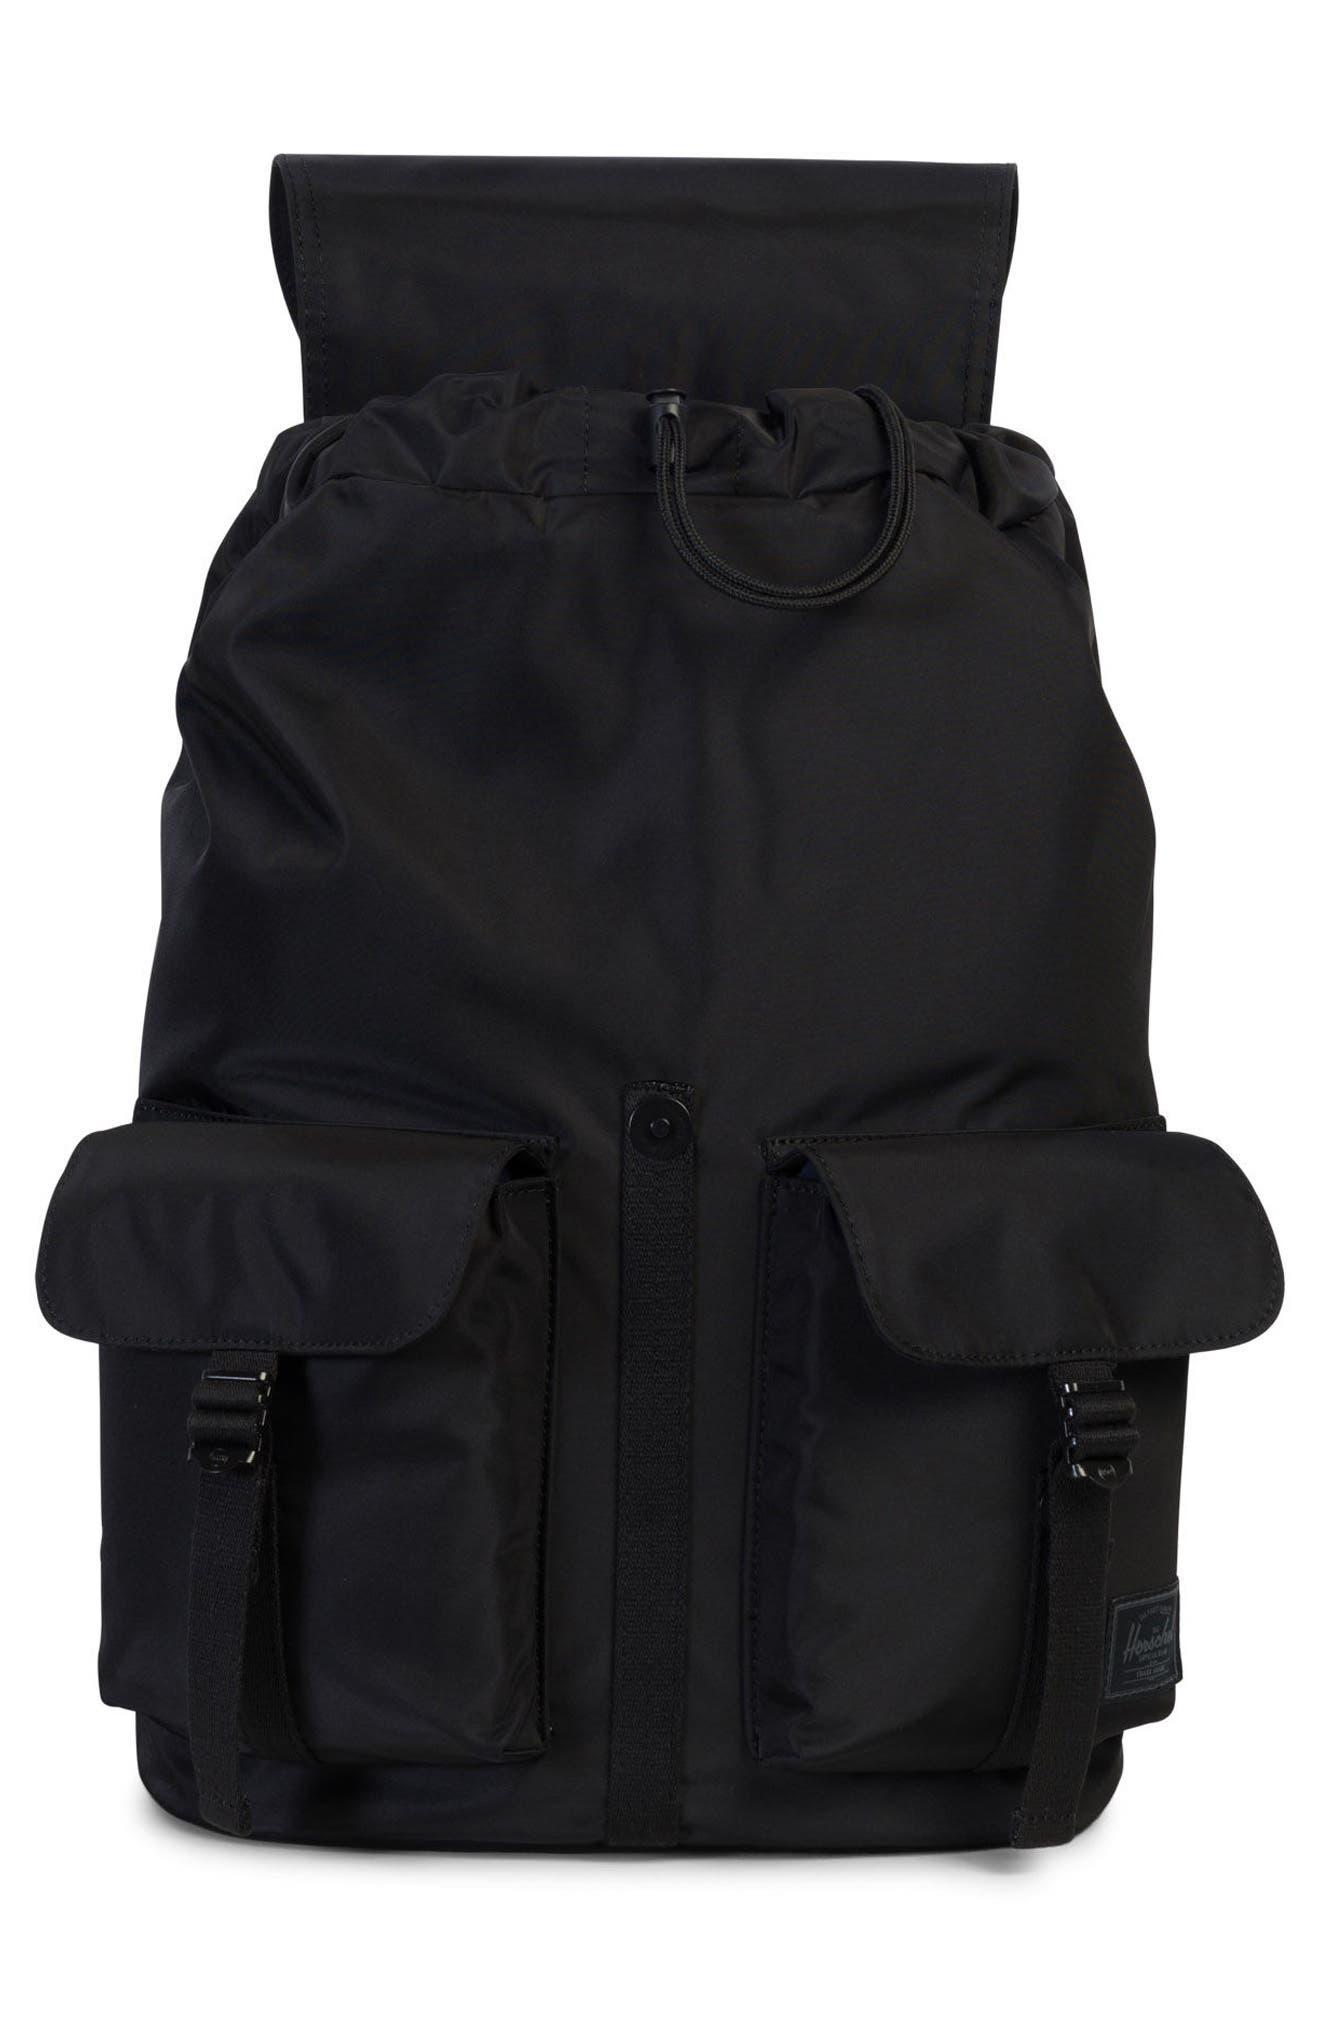 Dawson Surplus Collection Backpack,                             Alternate thumbnail 3, color,                             Black